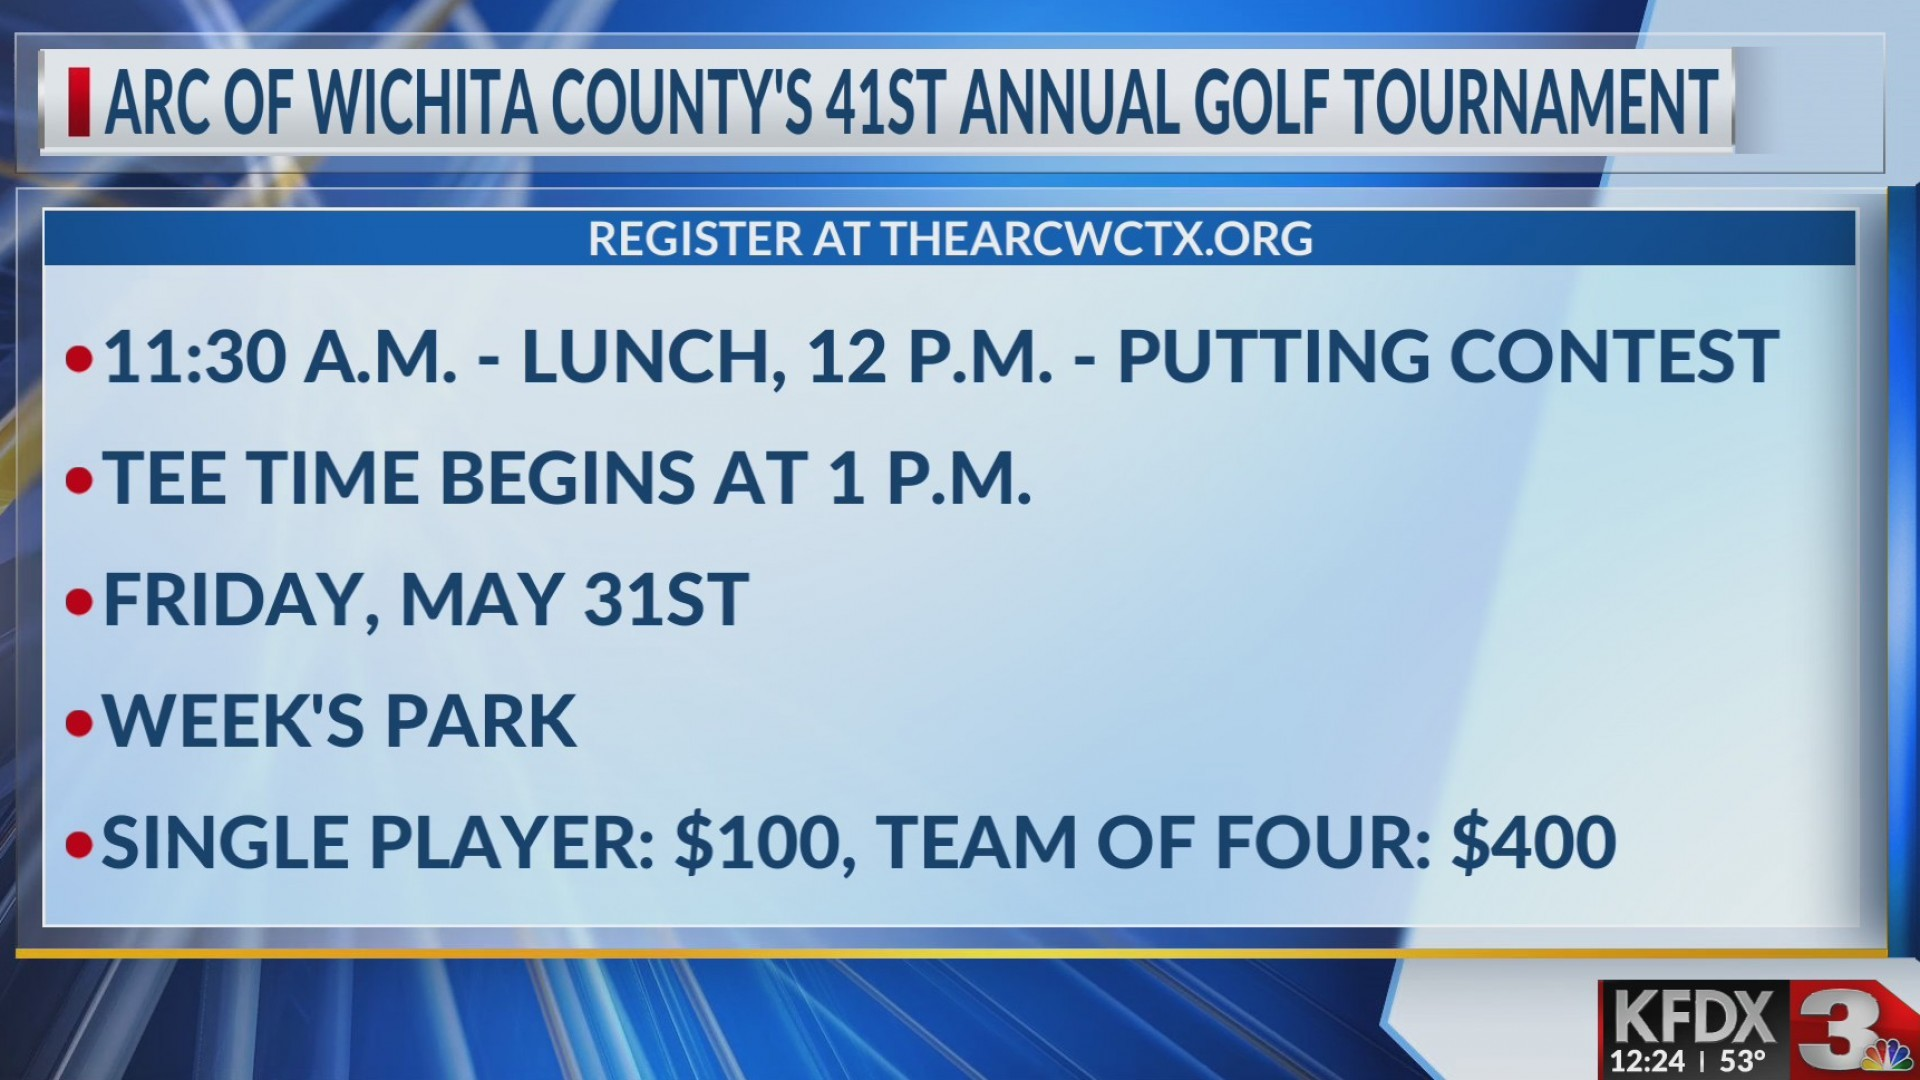 41st Annual ARC Golf Tournament